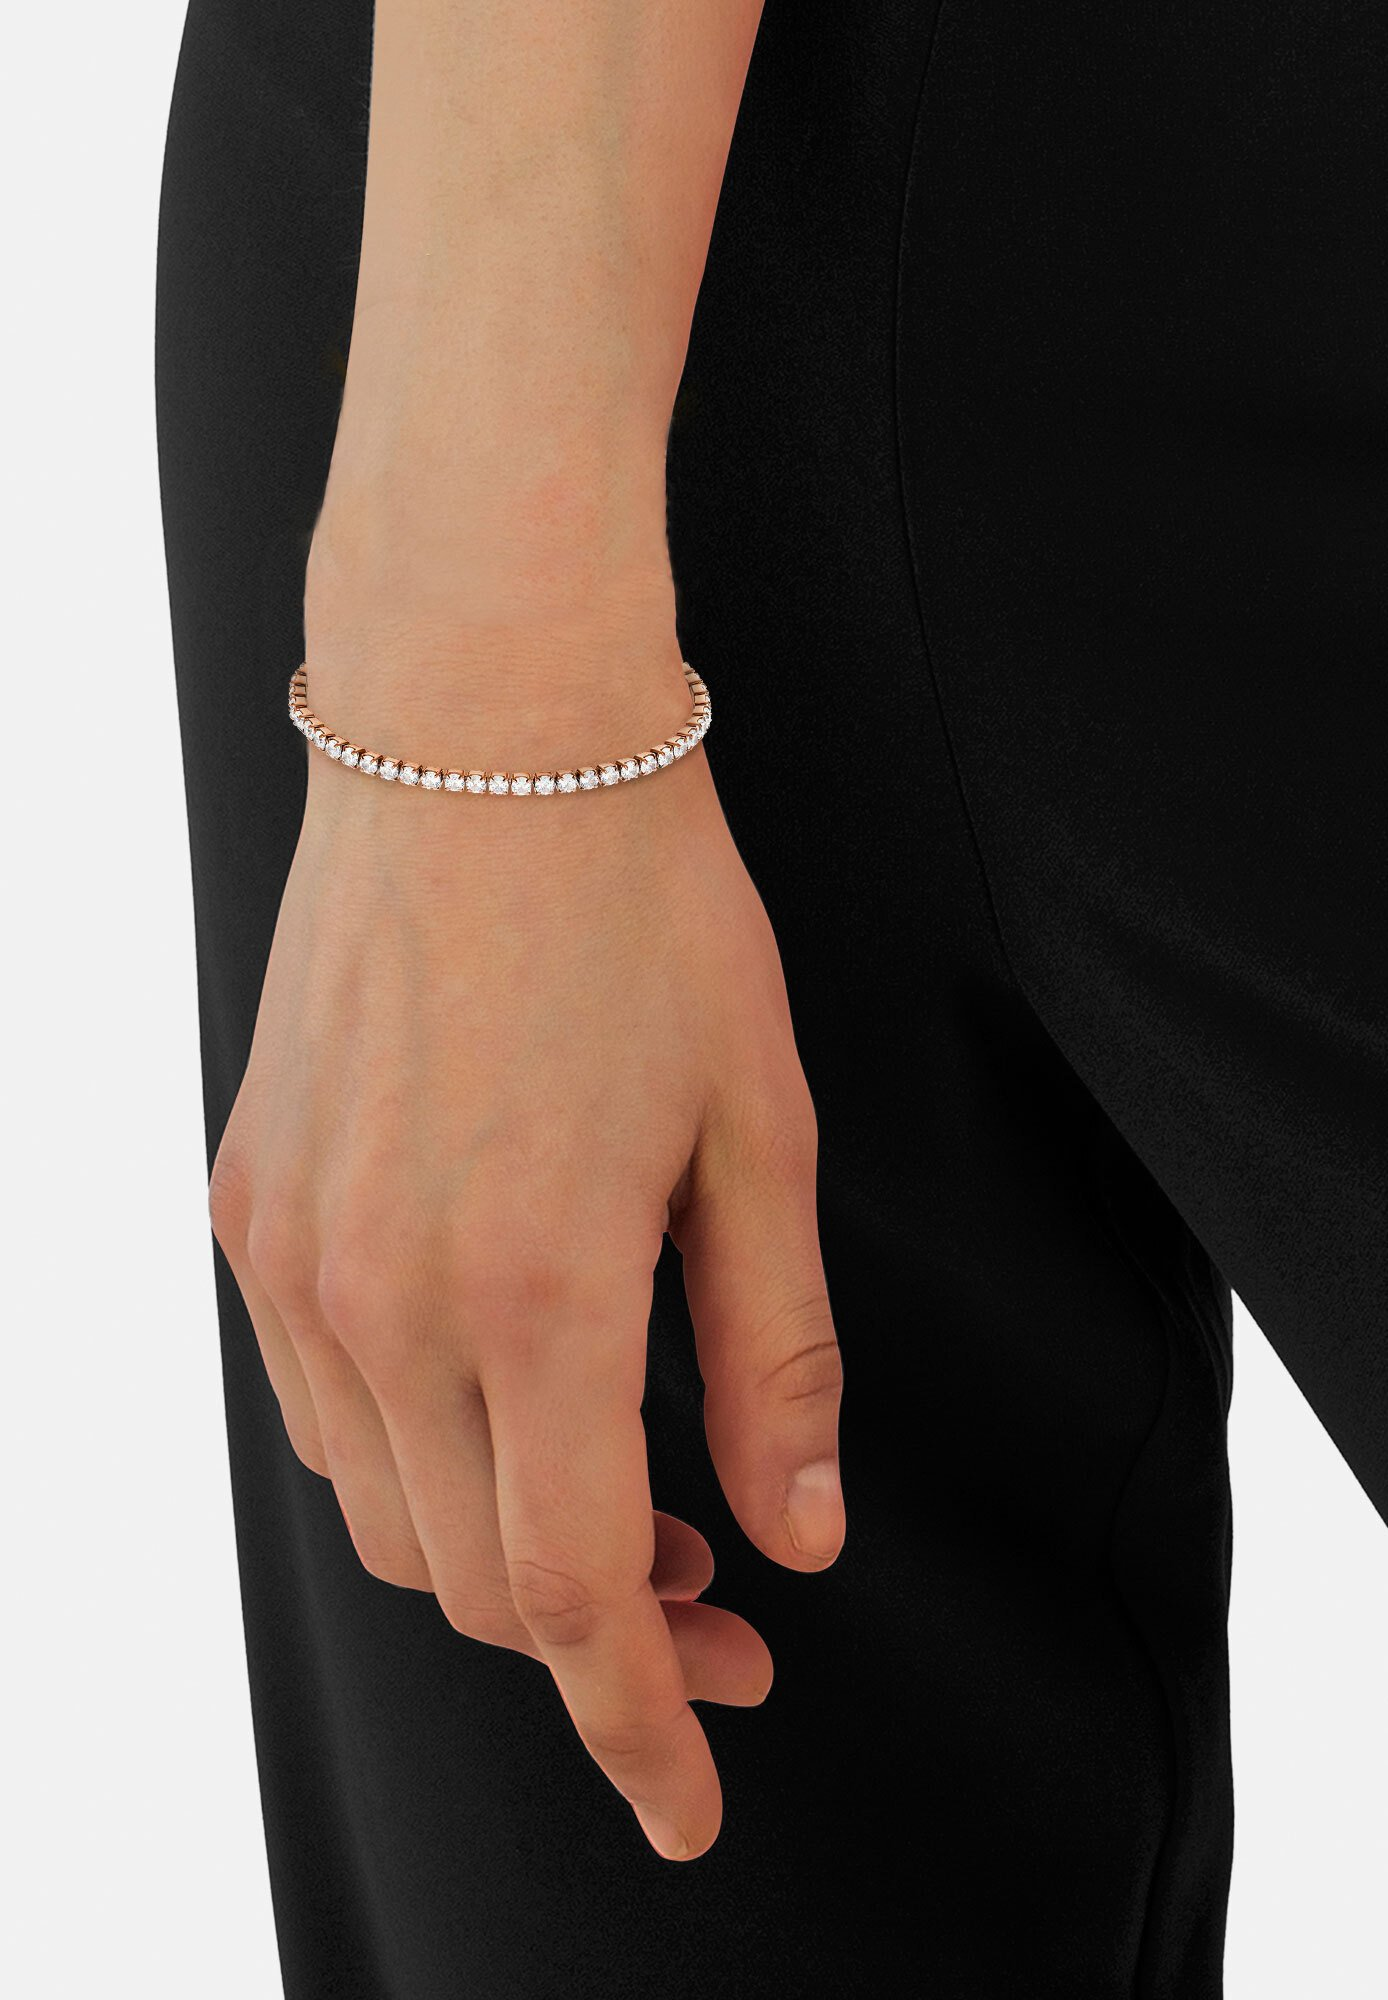 Femme ARMBAND PLURA - Bracelet